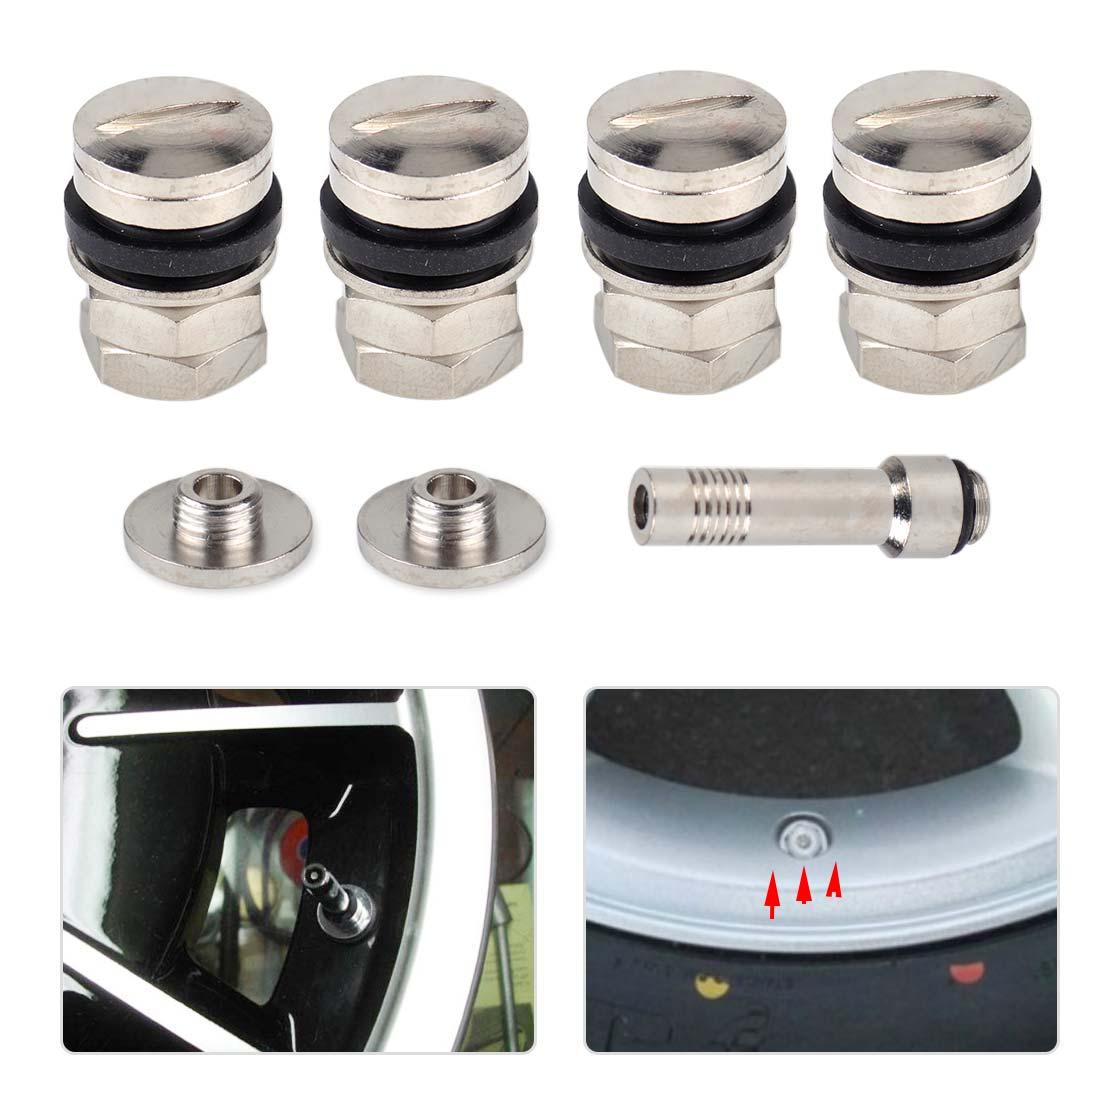 Universal 4xTubeless Plug in Wheel Rim Tire Valve Stem Rubber for TR414 Car